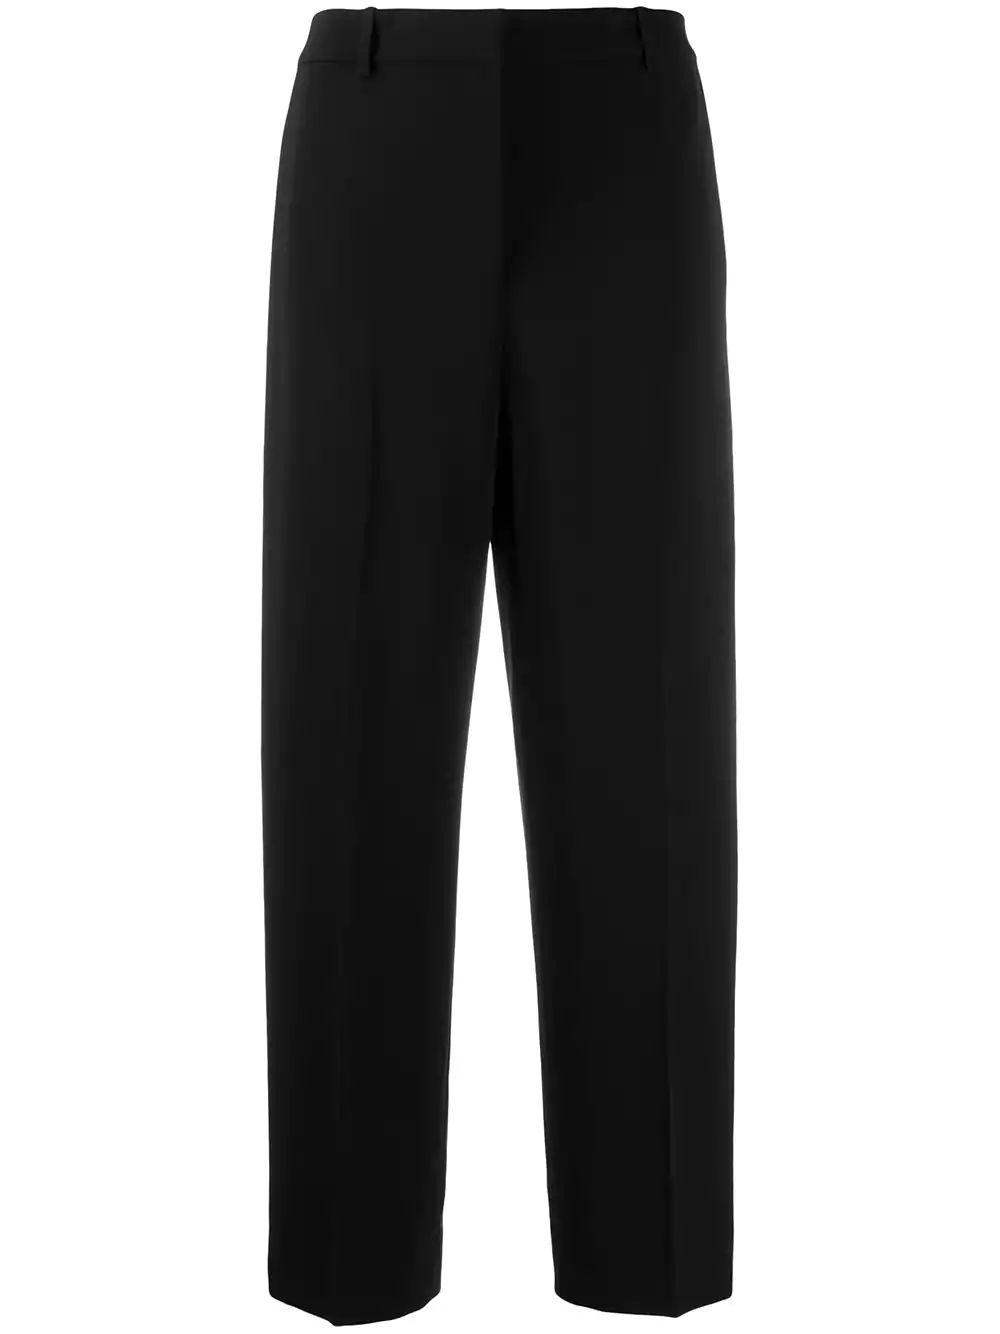 Classic Crepe High Waist Straight Trouser